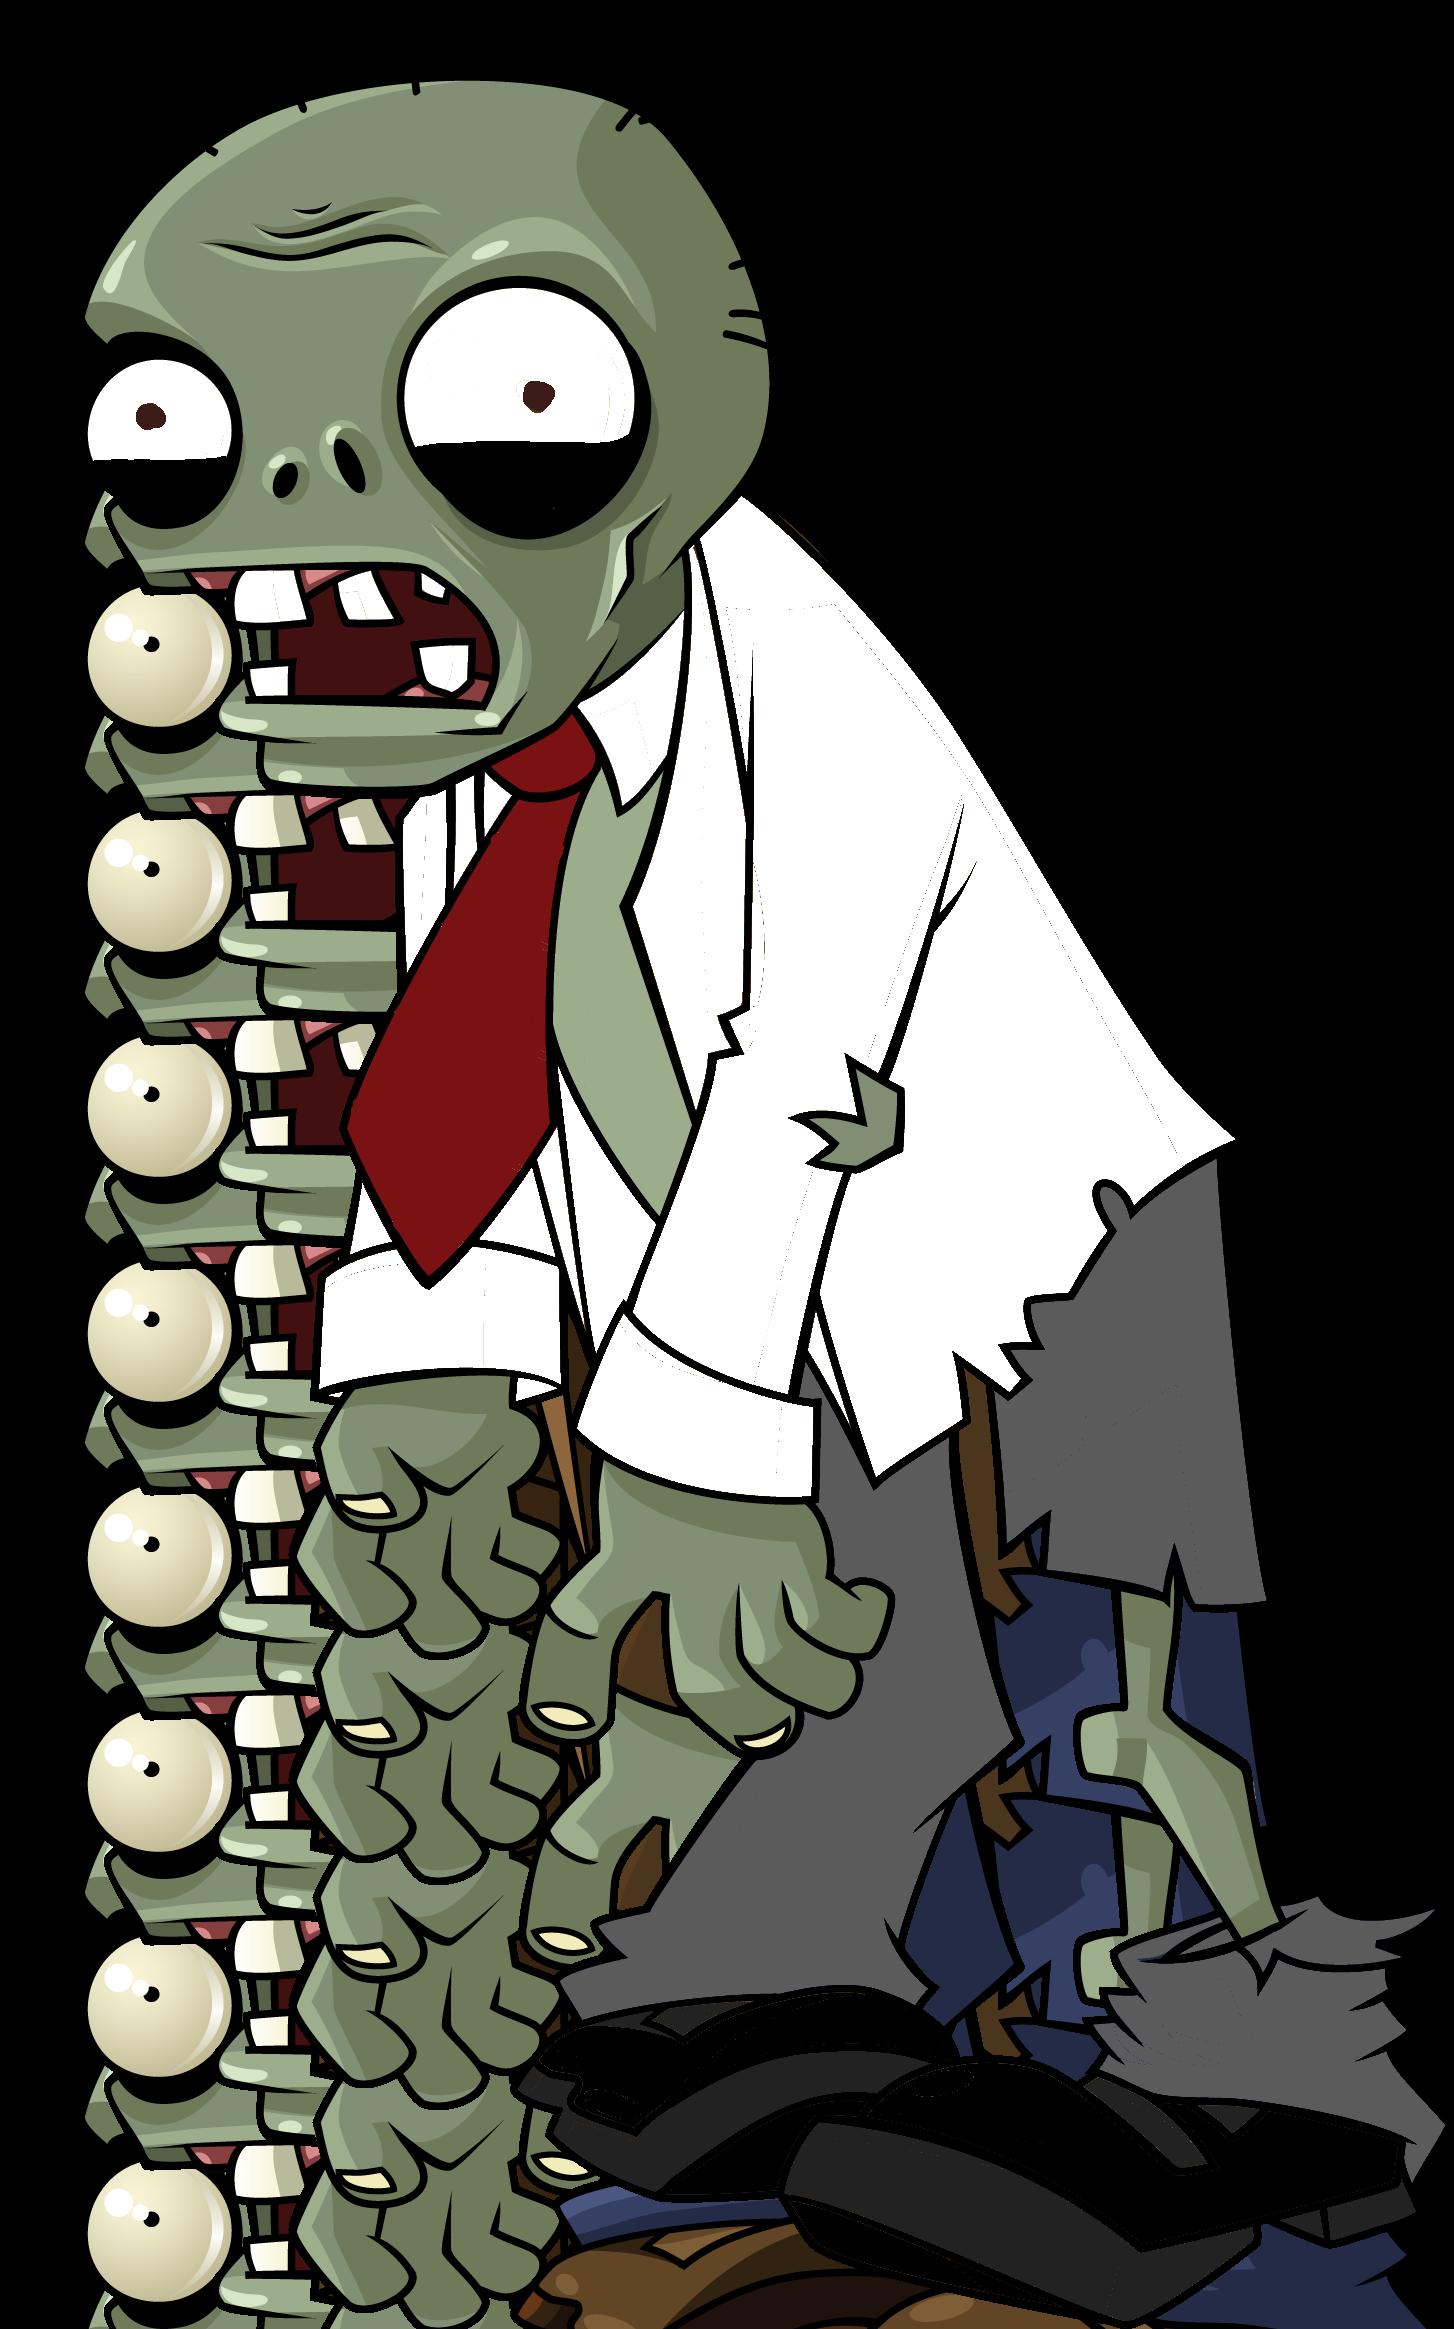 Zombie clipart zombie brain. Pill bottle plants vs